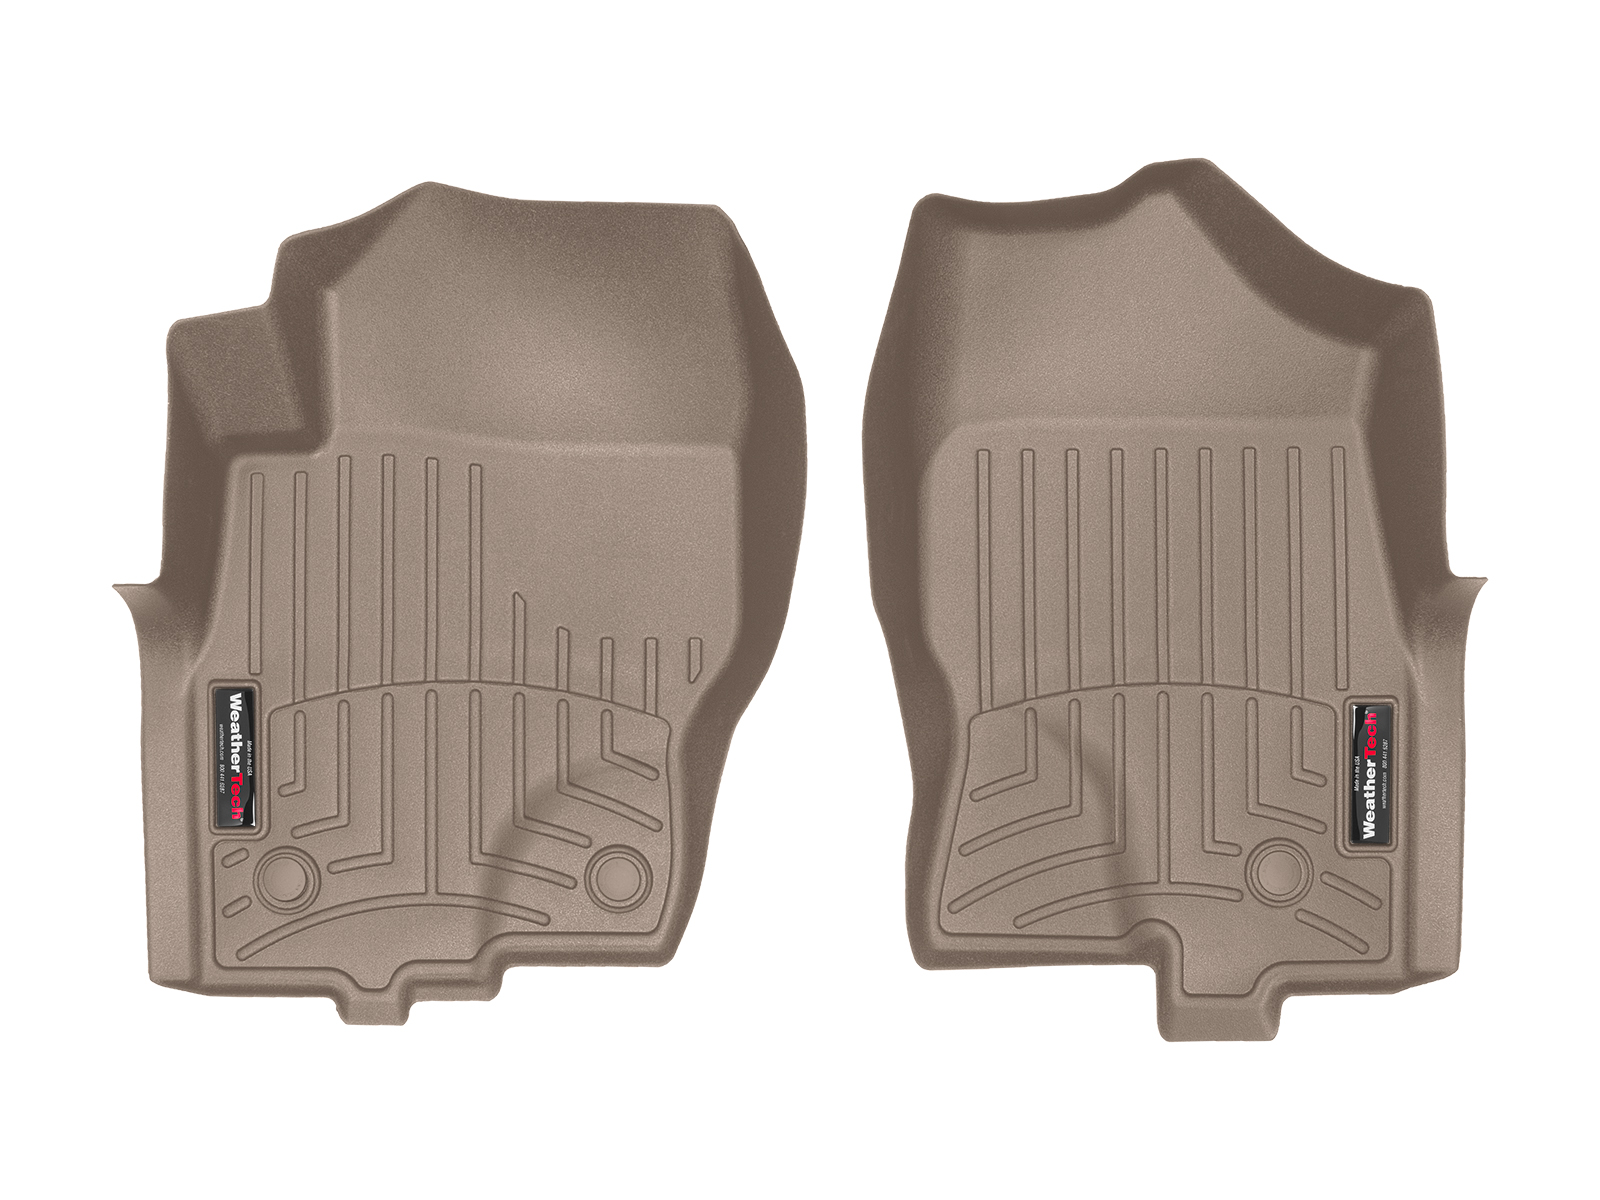 Tappeti gomma su misura bordo alto Nissan Navara 10>15 Marrone A2893